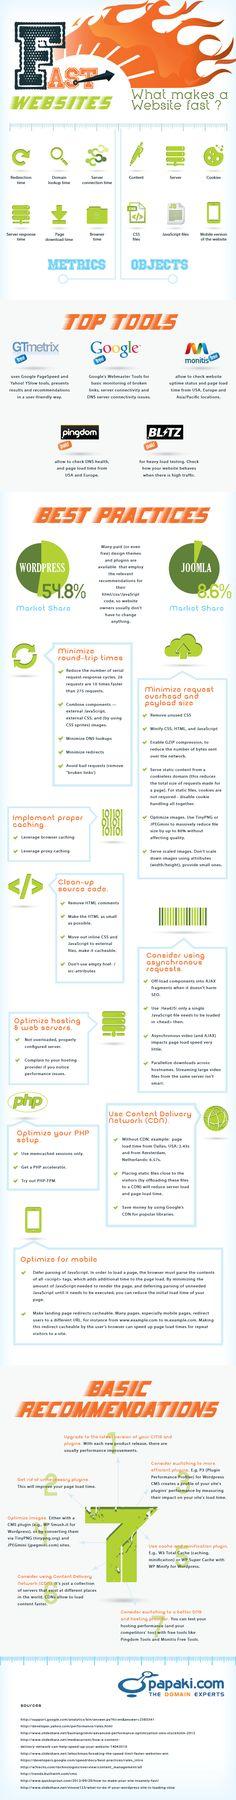 Website Optimization: What Makes A Website Fast? [Infographic] (Also best for Inbound Marketing, Marketing Digital, Internet Marketing, Online Marketing, Website Optimization, Search Engine Optimization, Marketing Merchandise, Web Design, Graphic Design